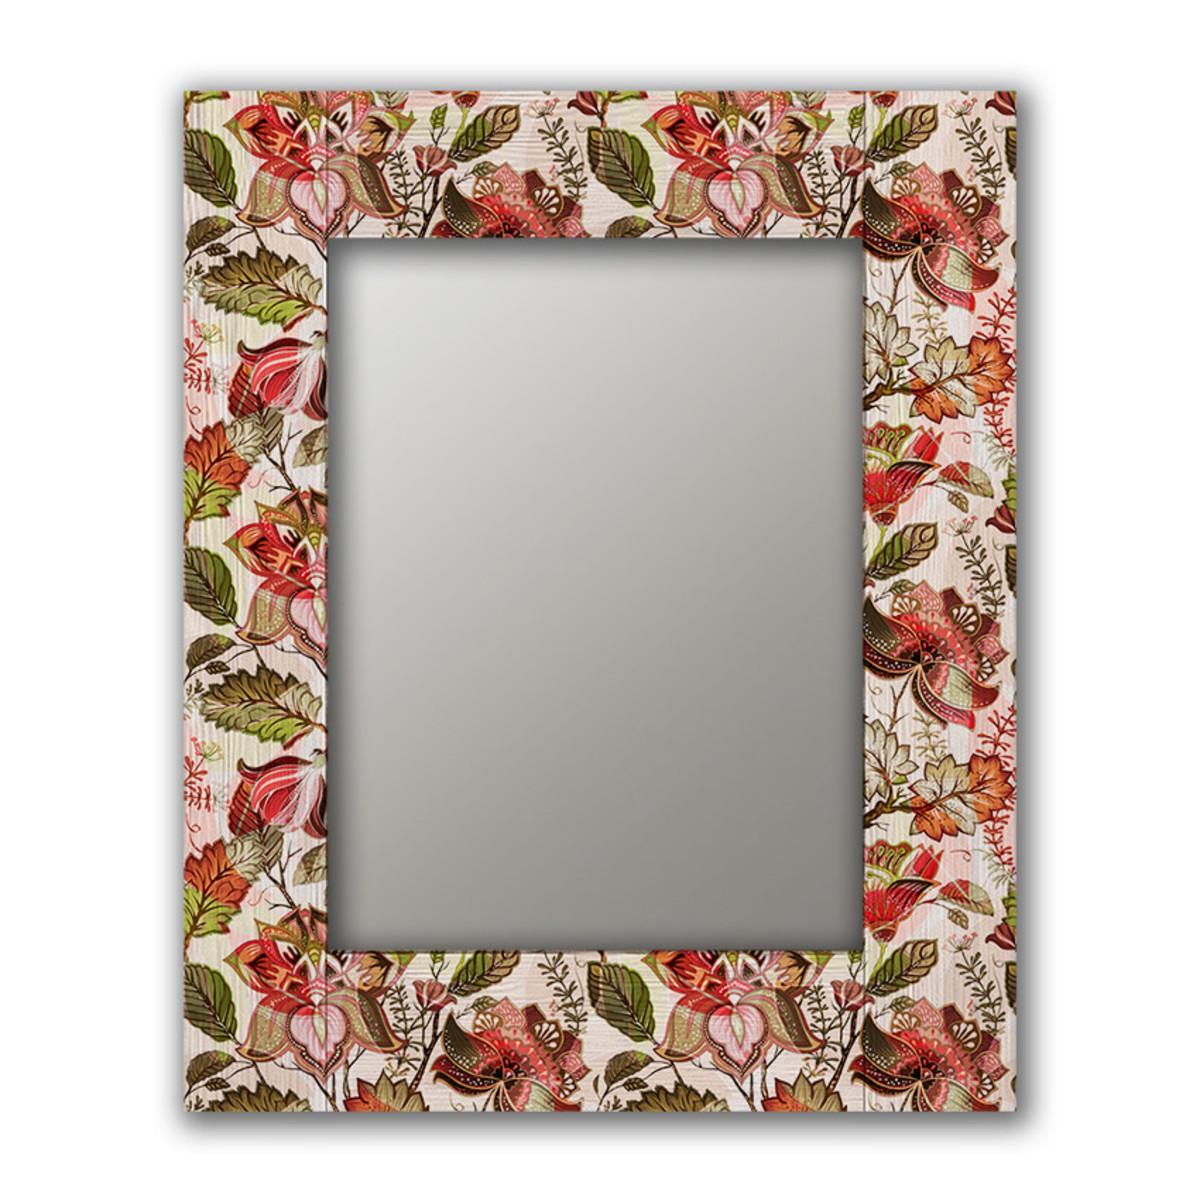 Настенное зеркало Дом Корлеоне Цветы Прованс 75х110 см